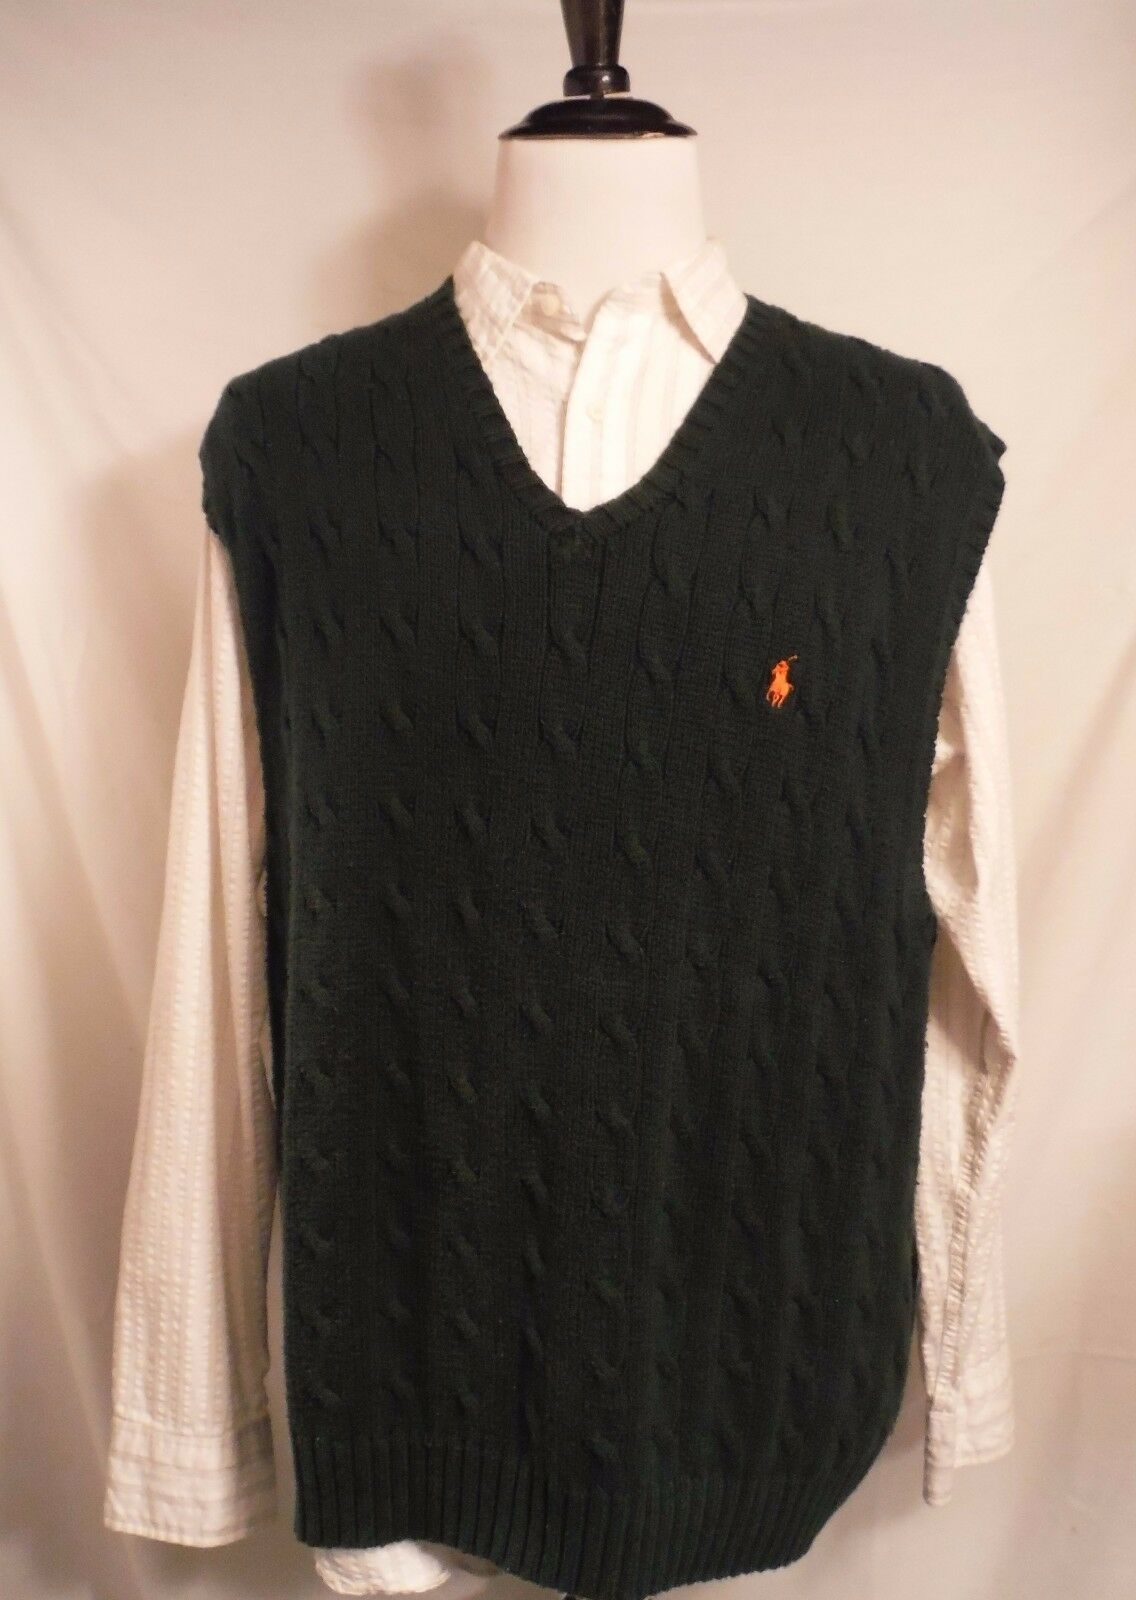 Ralph Lauren Mens Cable Knit Fisherman Forrest Green Cotton Sweater Vest Size XL